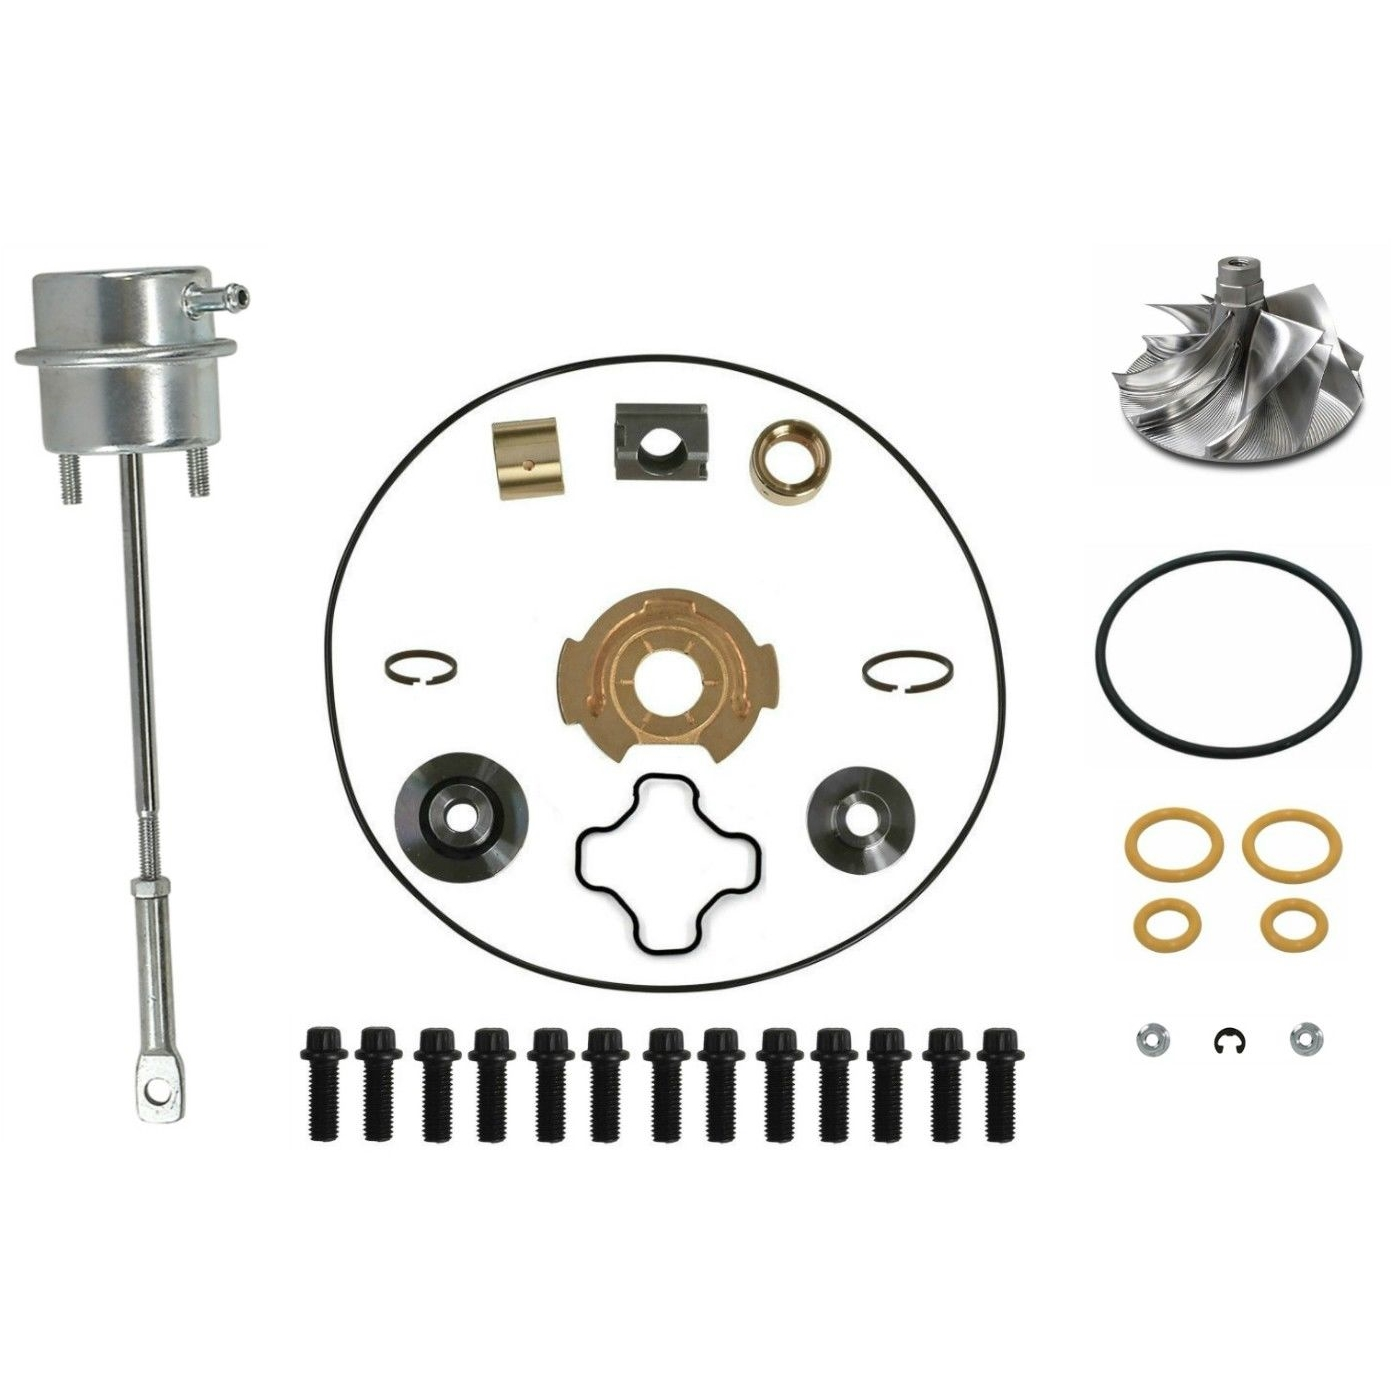 GTP38 Turbo Rebuild Kit Billet Compressor Wheel Wastegate Actuator For 99-03 7.3L Ford Powerstroke Diesel